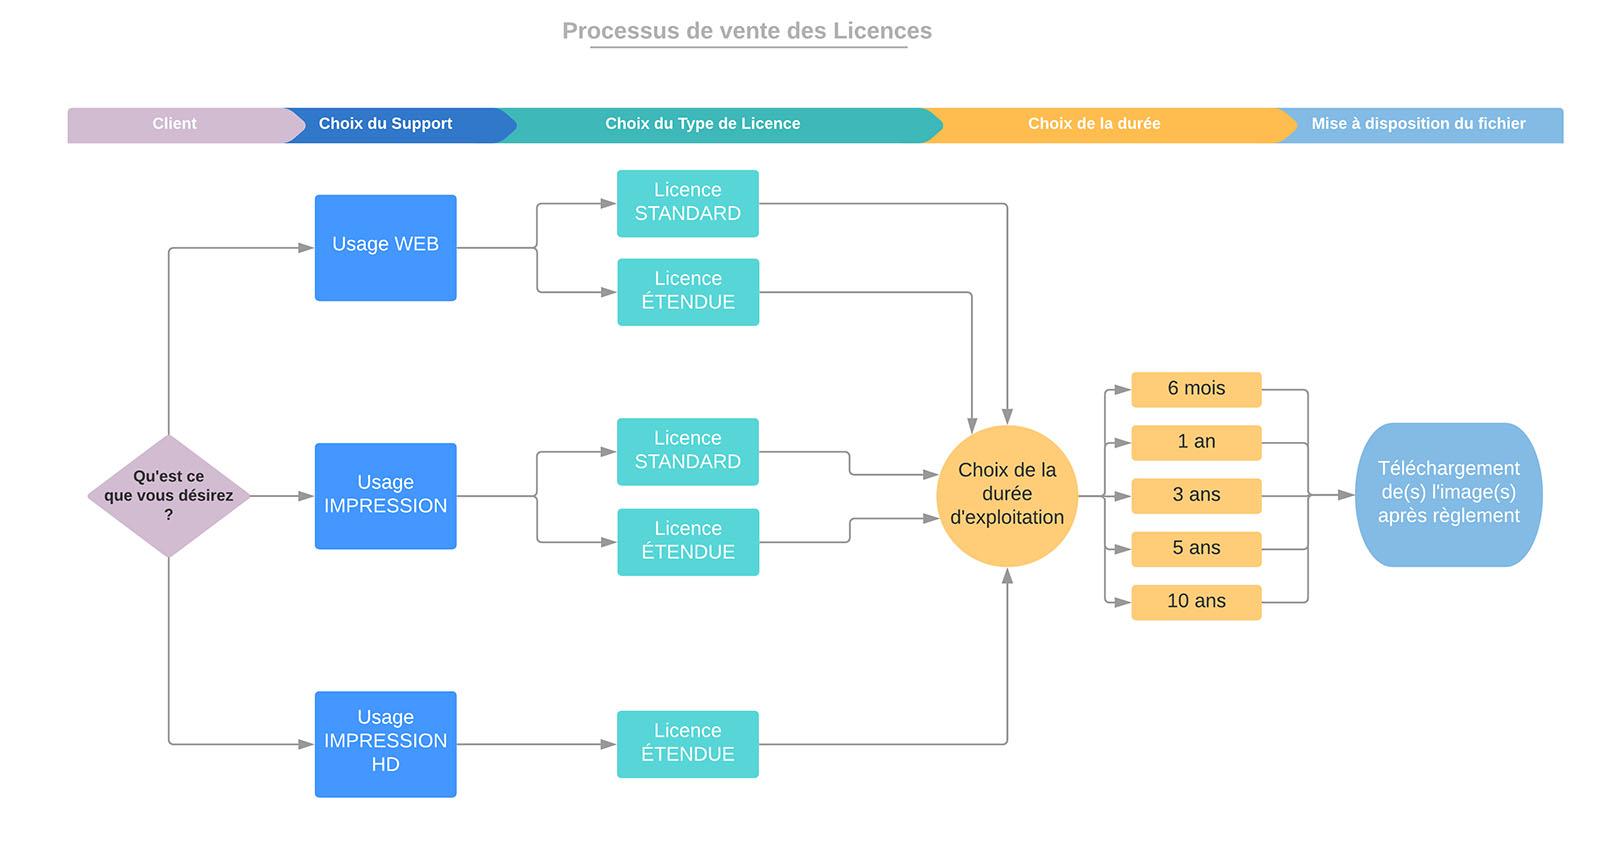 Processus de vente des Licences